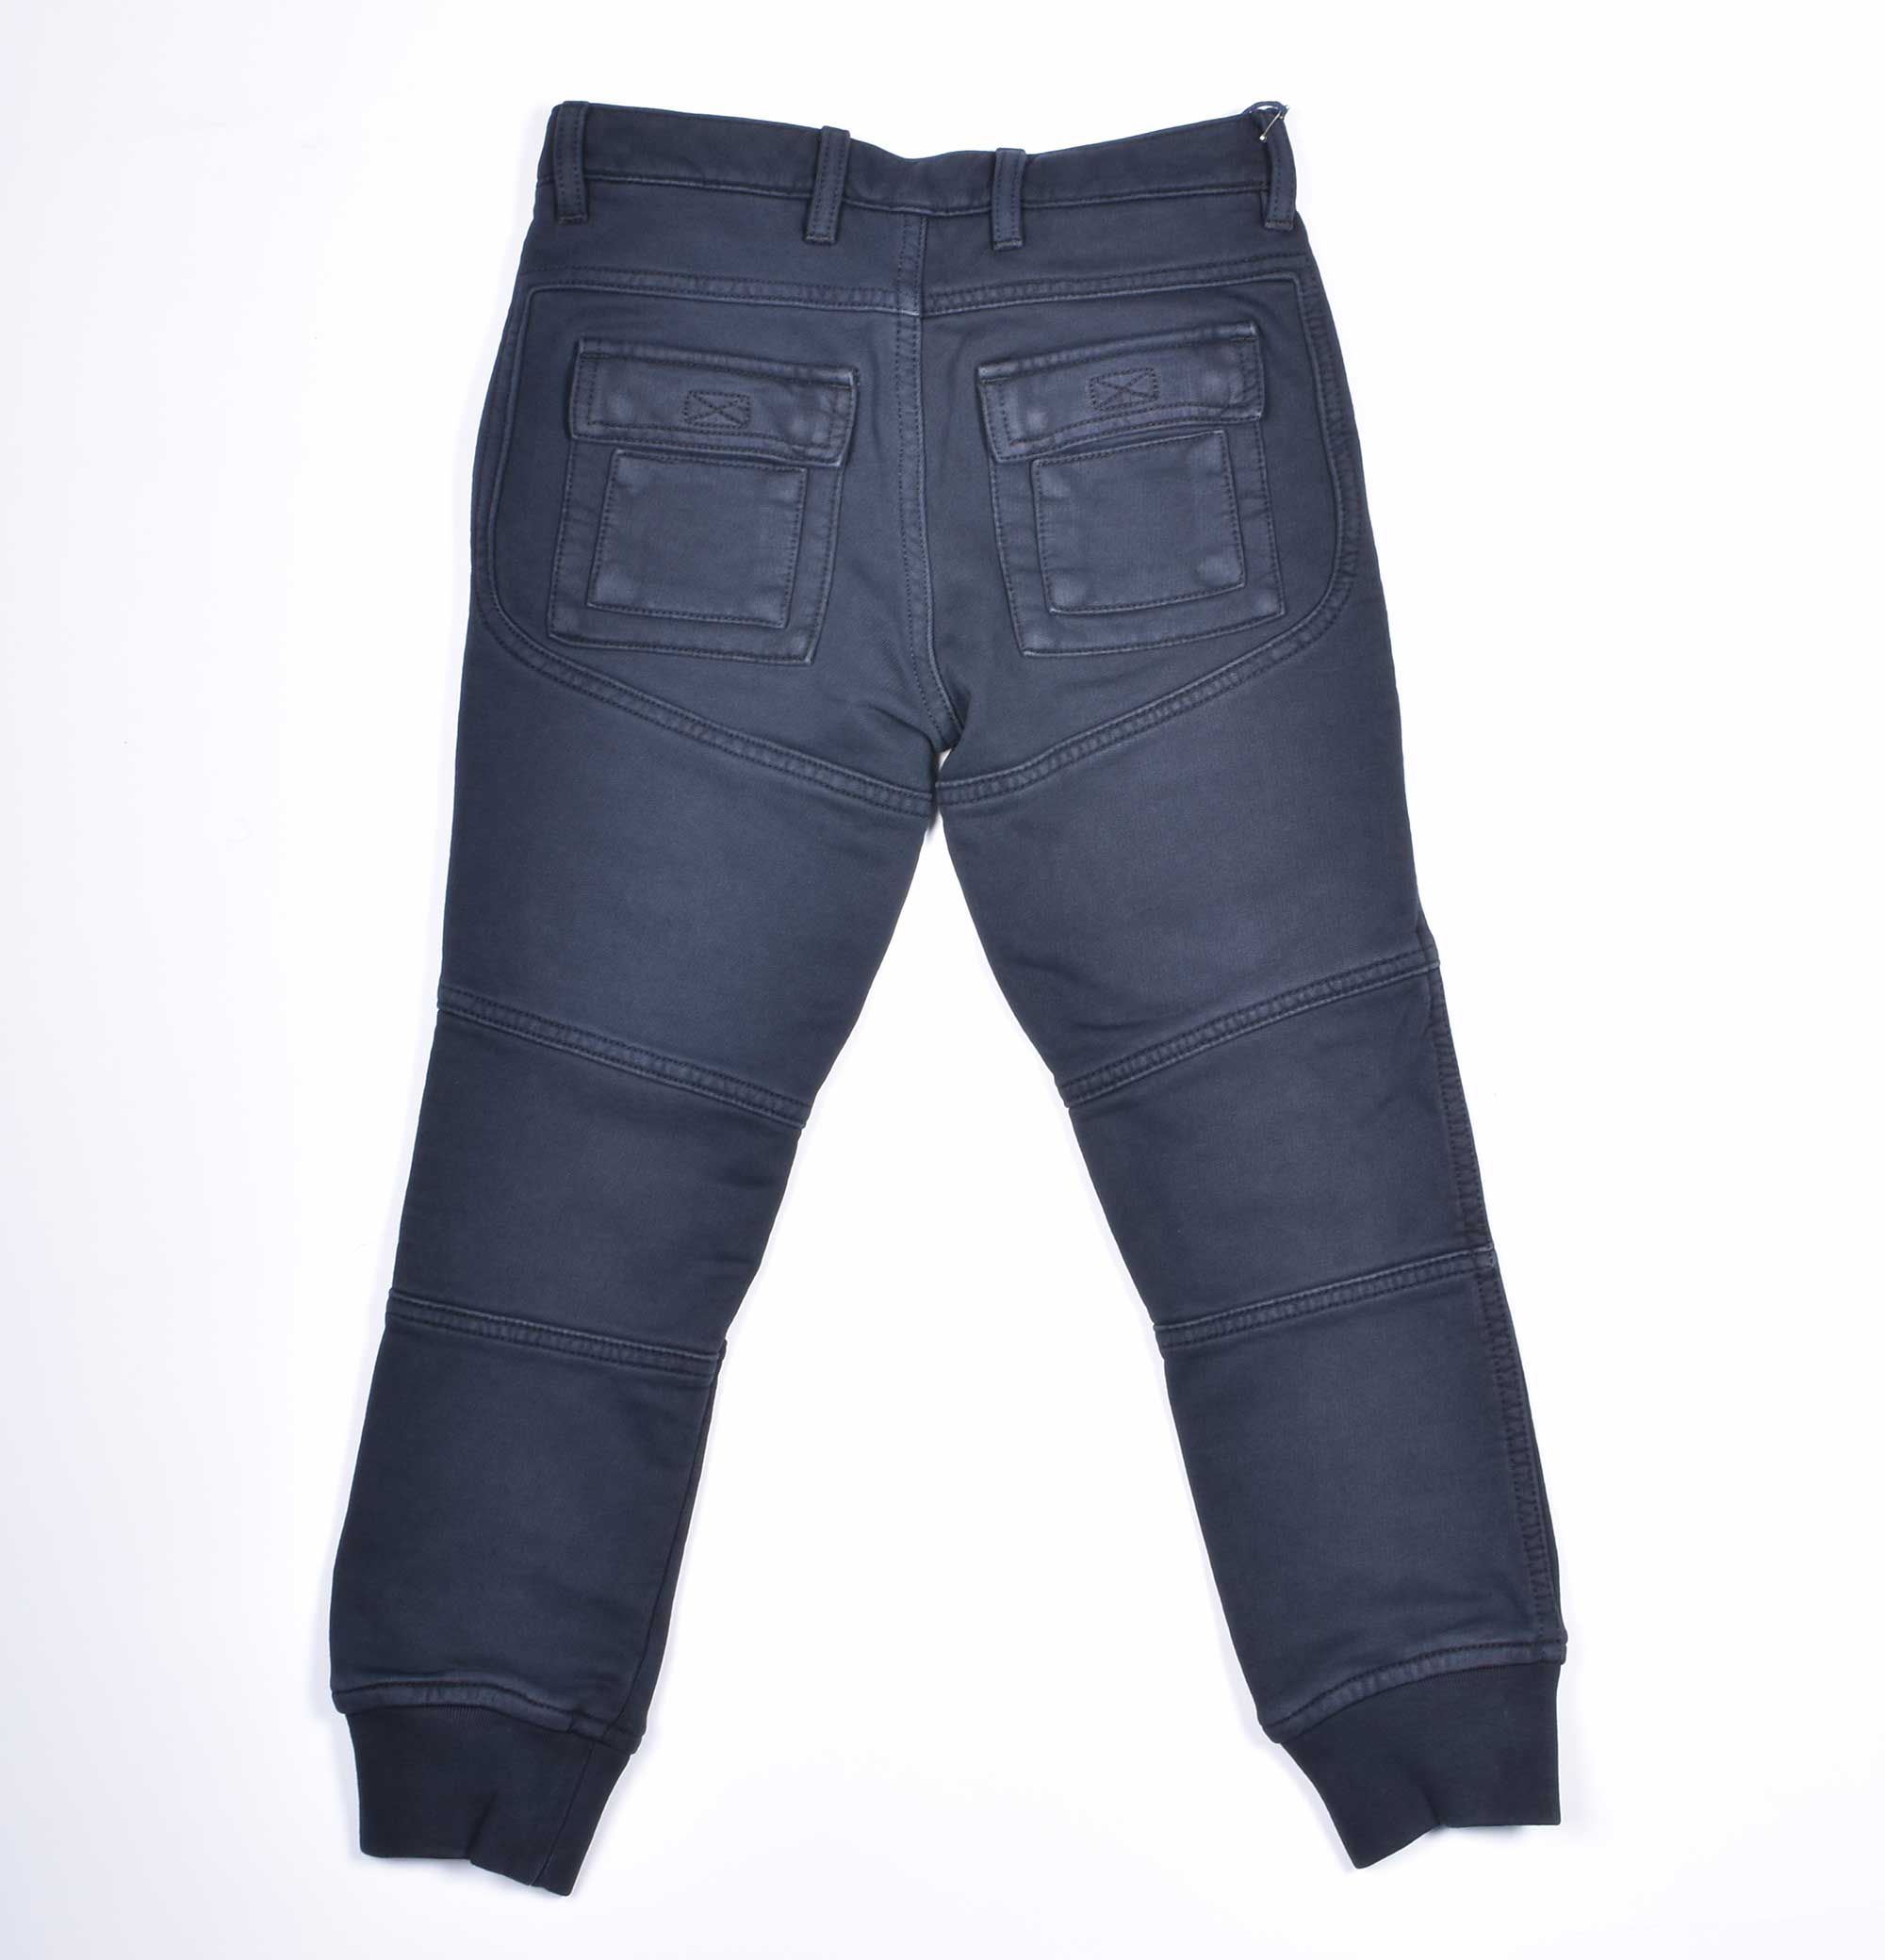 Pantalone felpa anti g - Blu navy